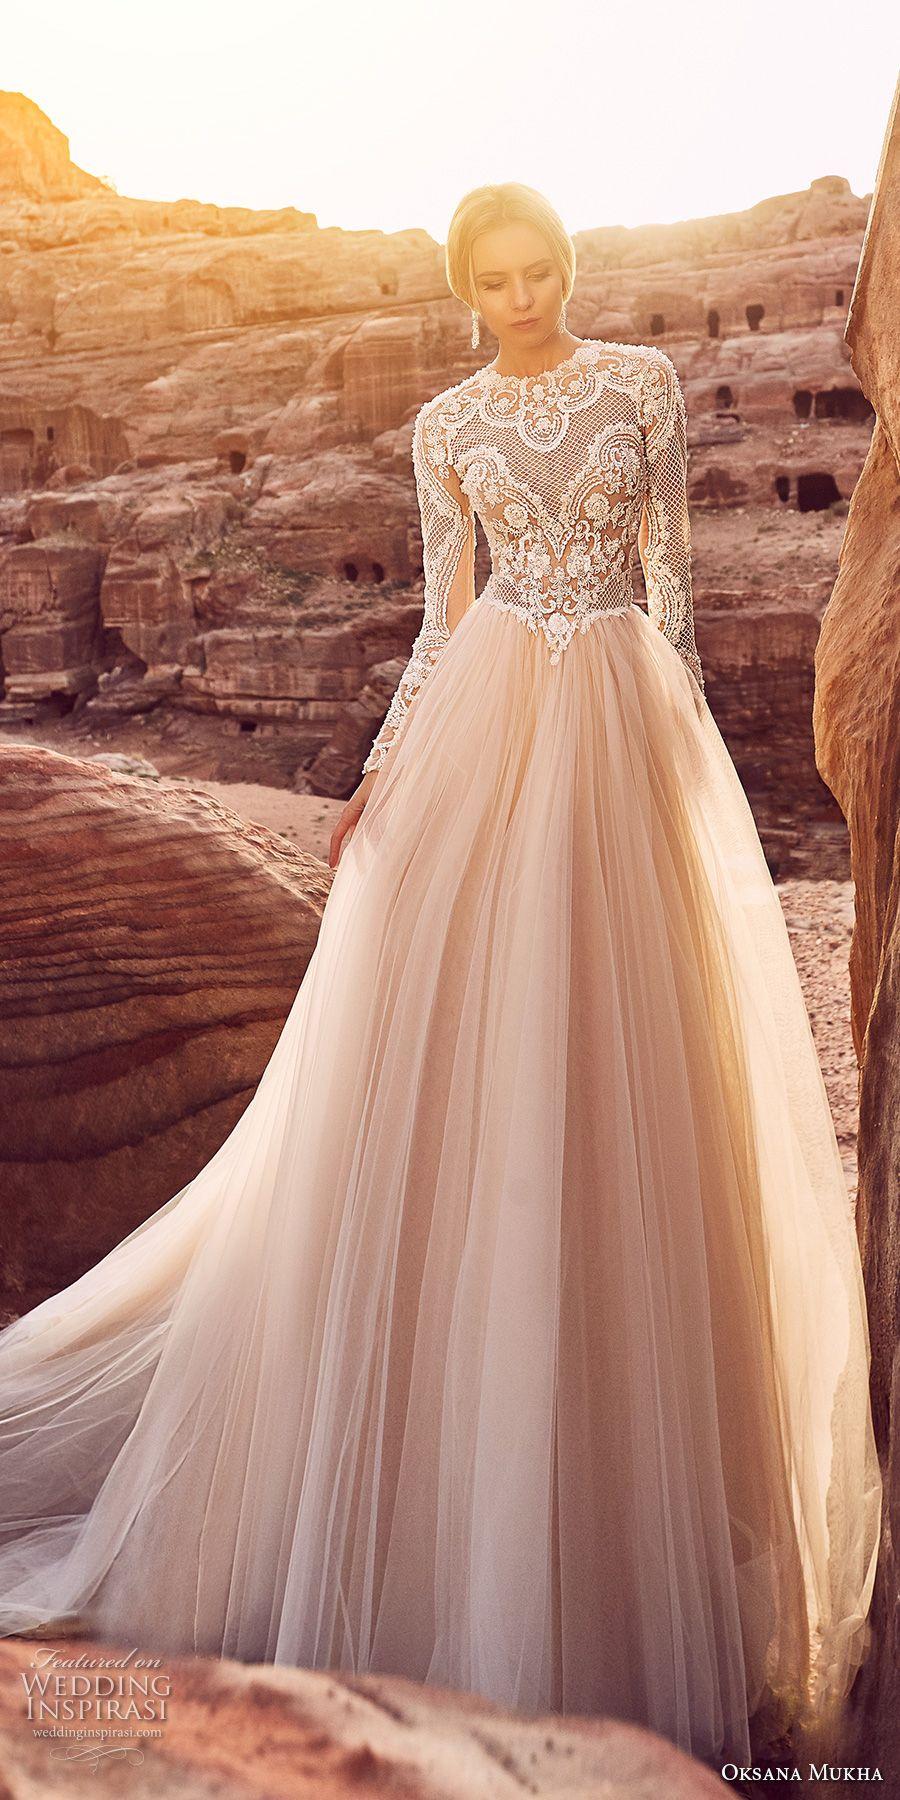 Oksana Mukha Wedding Dresses Pinterest Wedding dress Lace